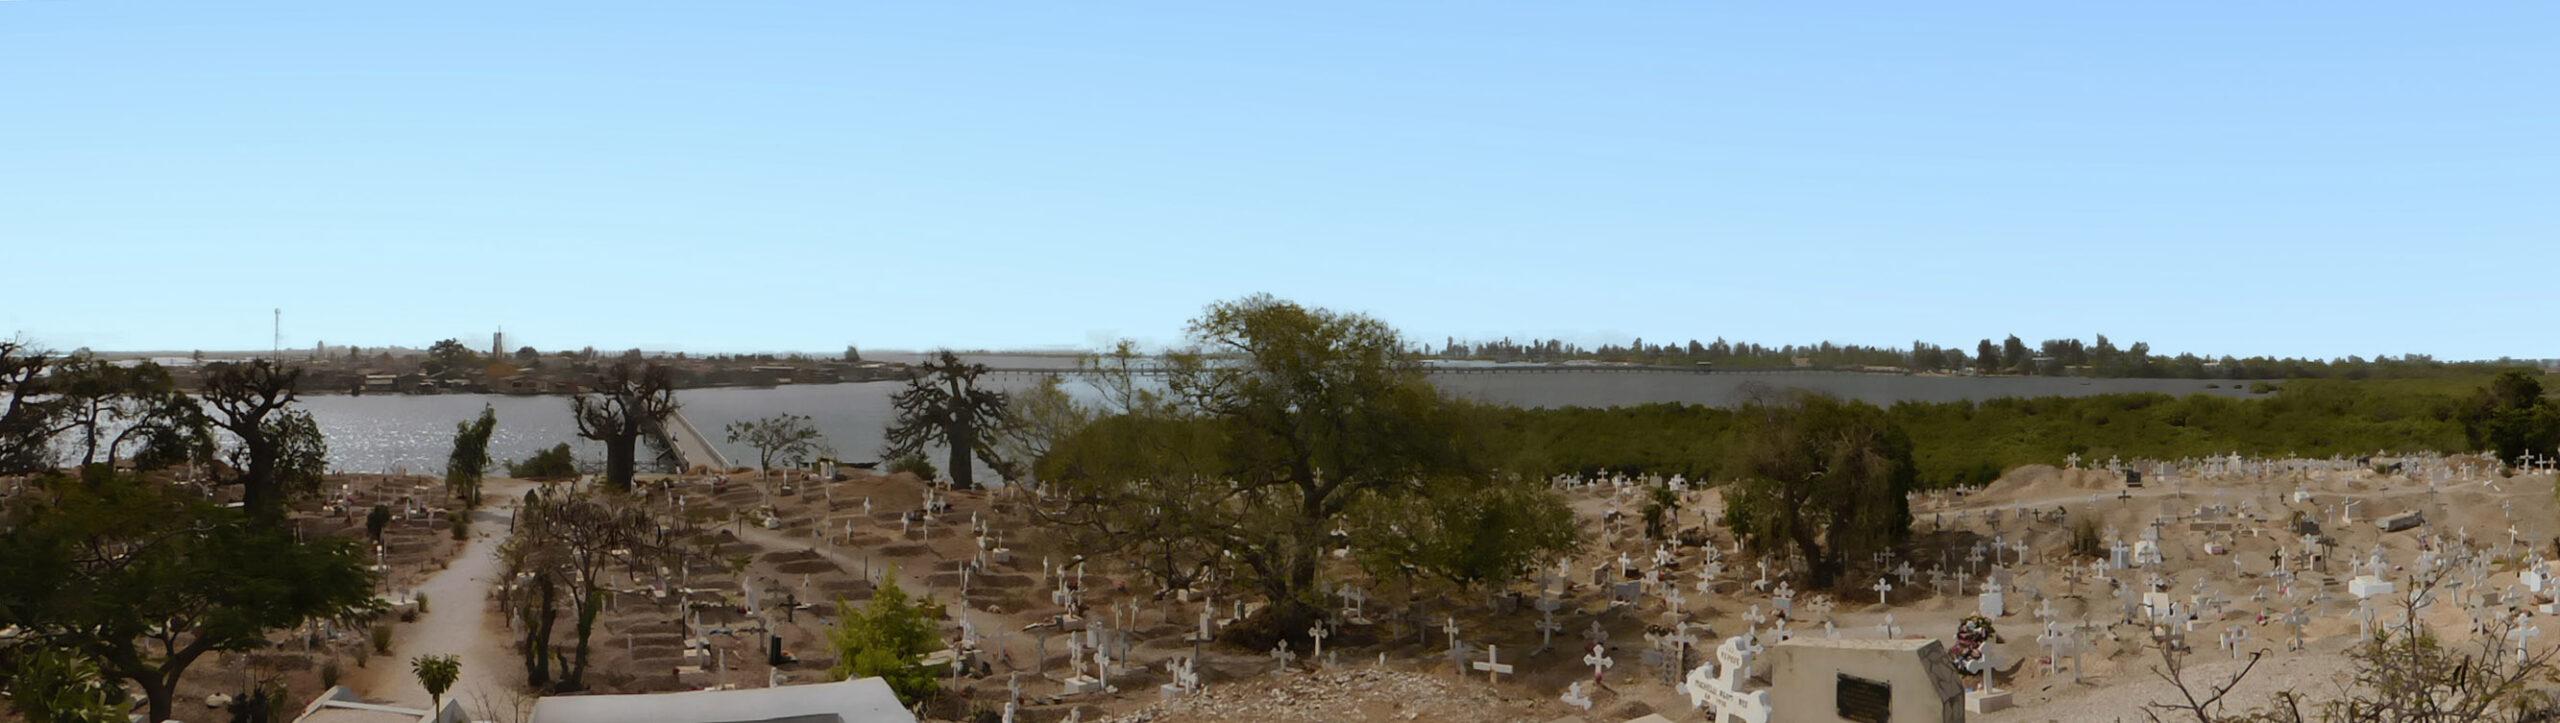 Panorama of cemetery with mangrove lagoon